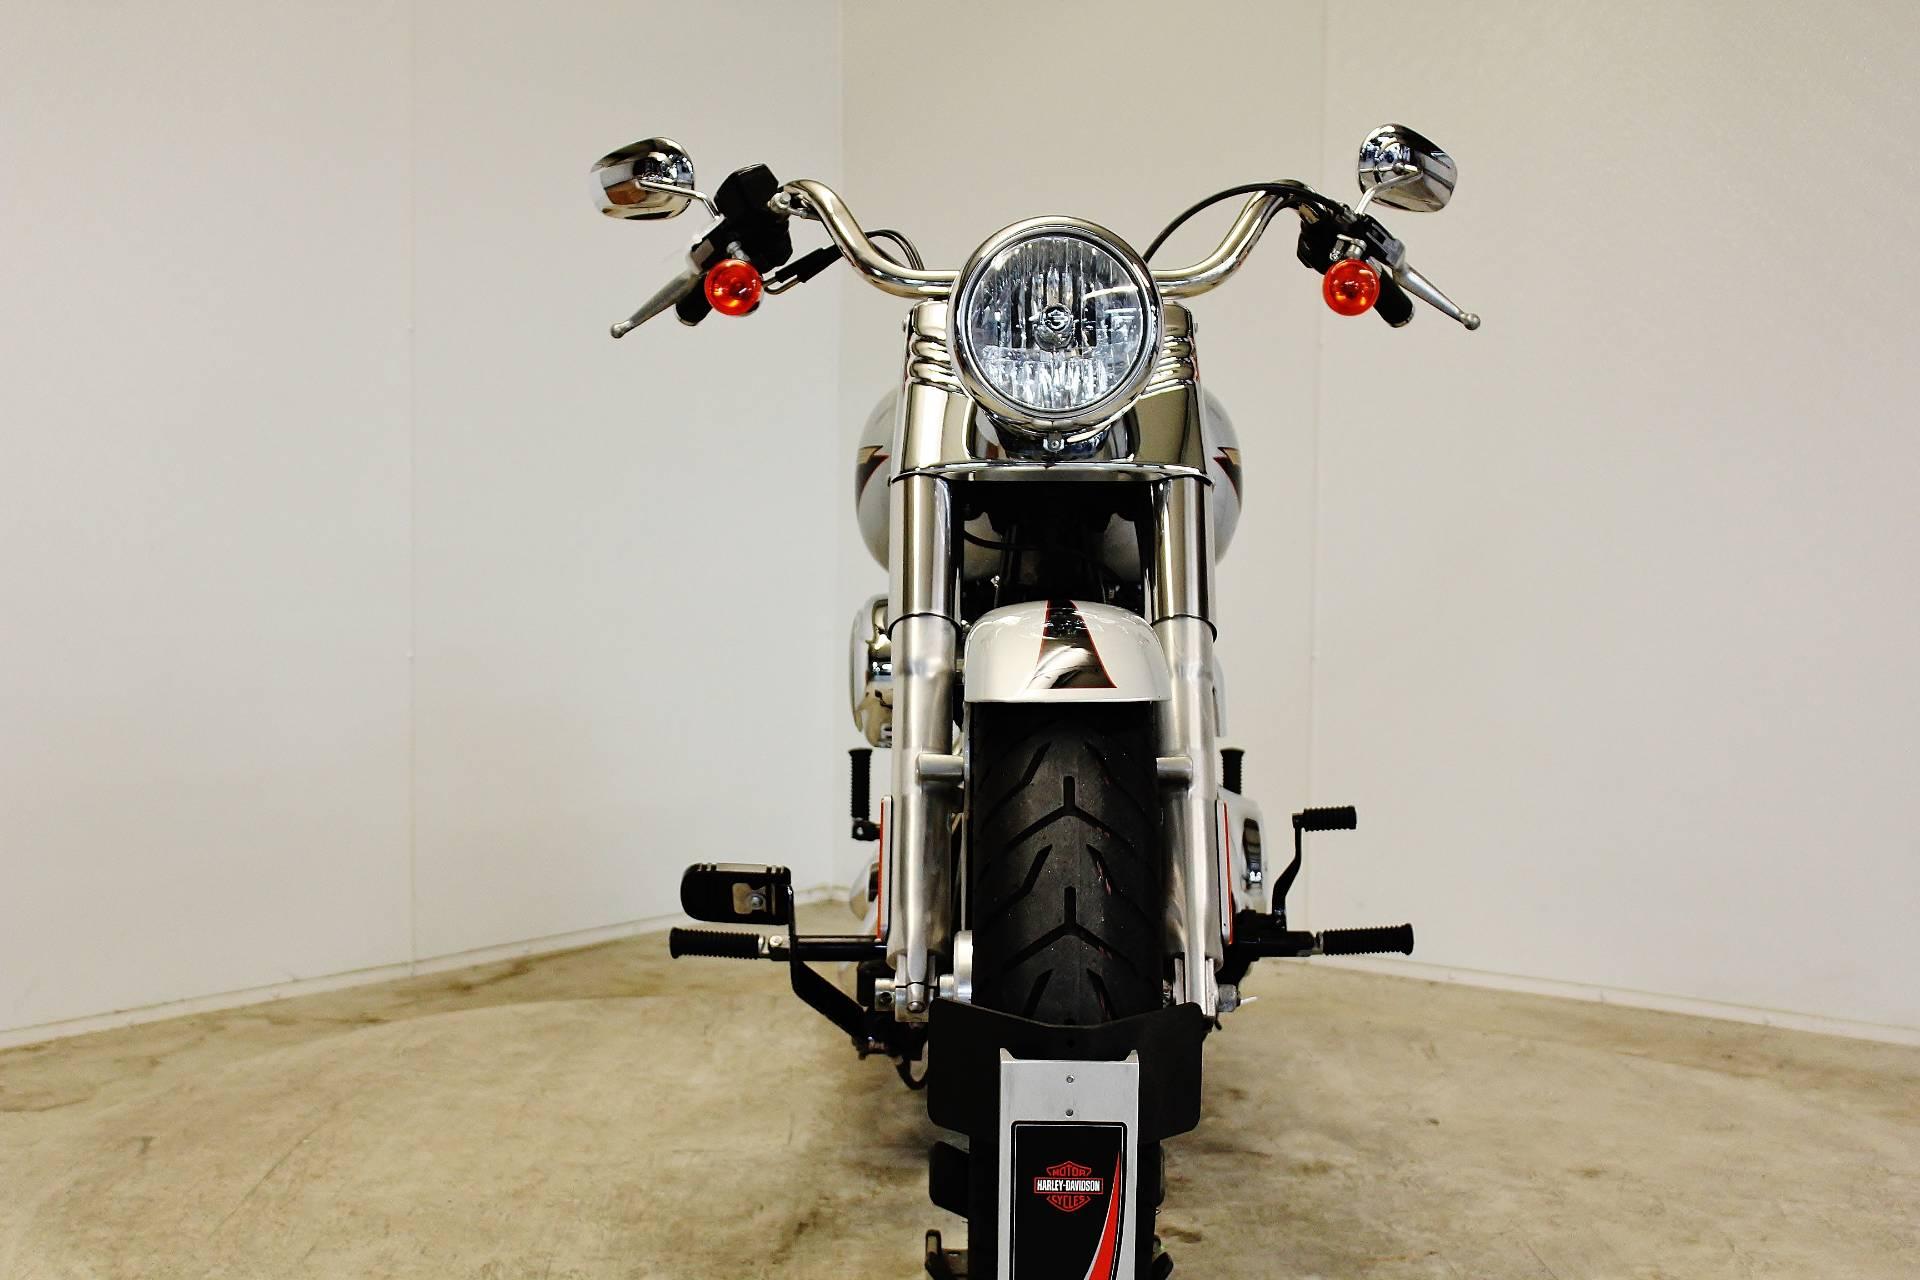 2010 Harley-Davidson Softail® Fat Boy® in Pittsfield, Massachusetts